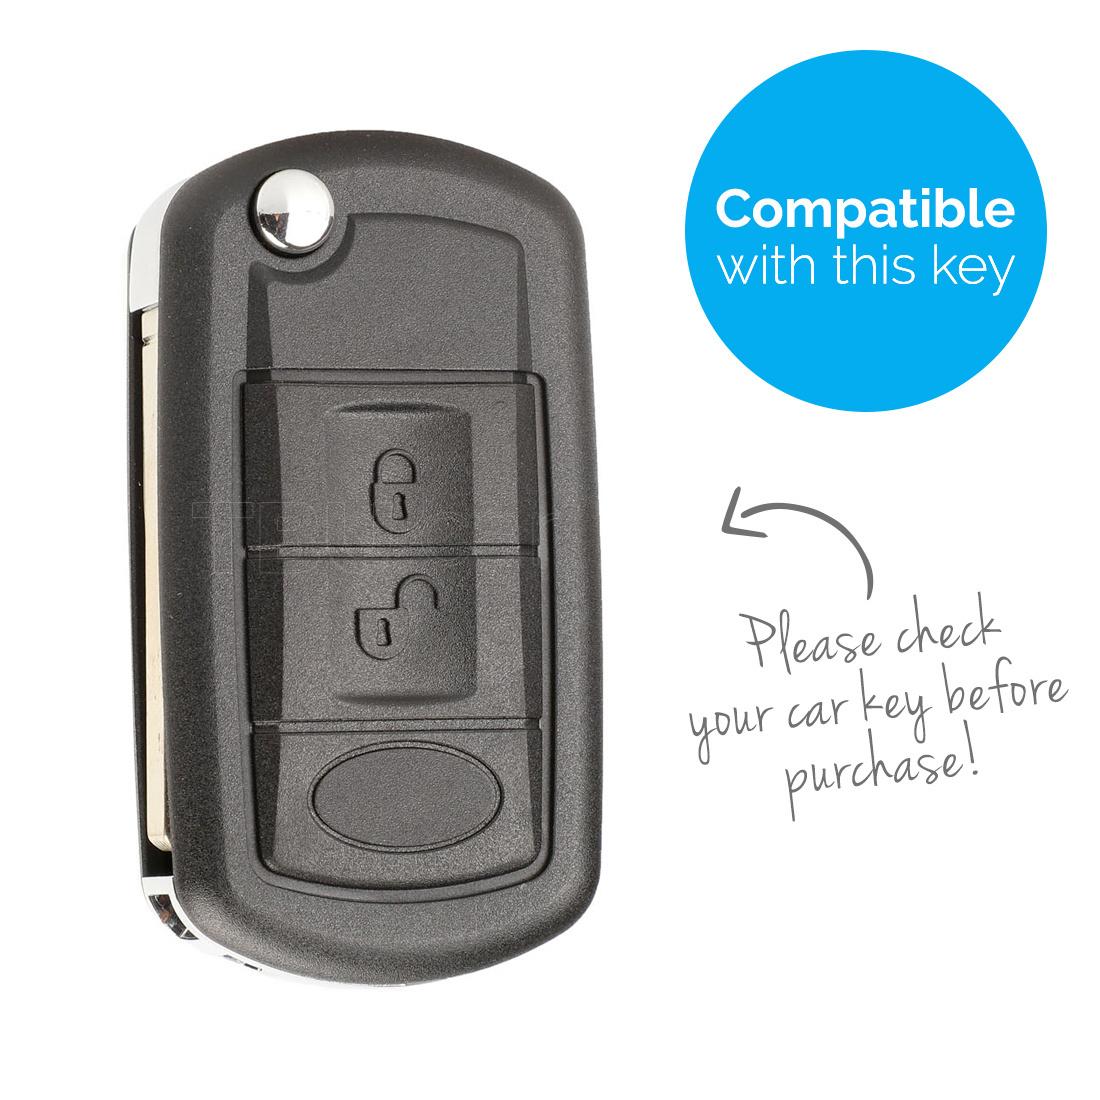 TBU car TBU car Sleutel cover compatibel met Land Rover - Silicone sleutelhoesje - beschermhoesje autosleutel - Wit